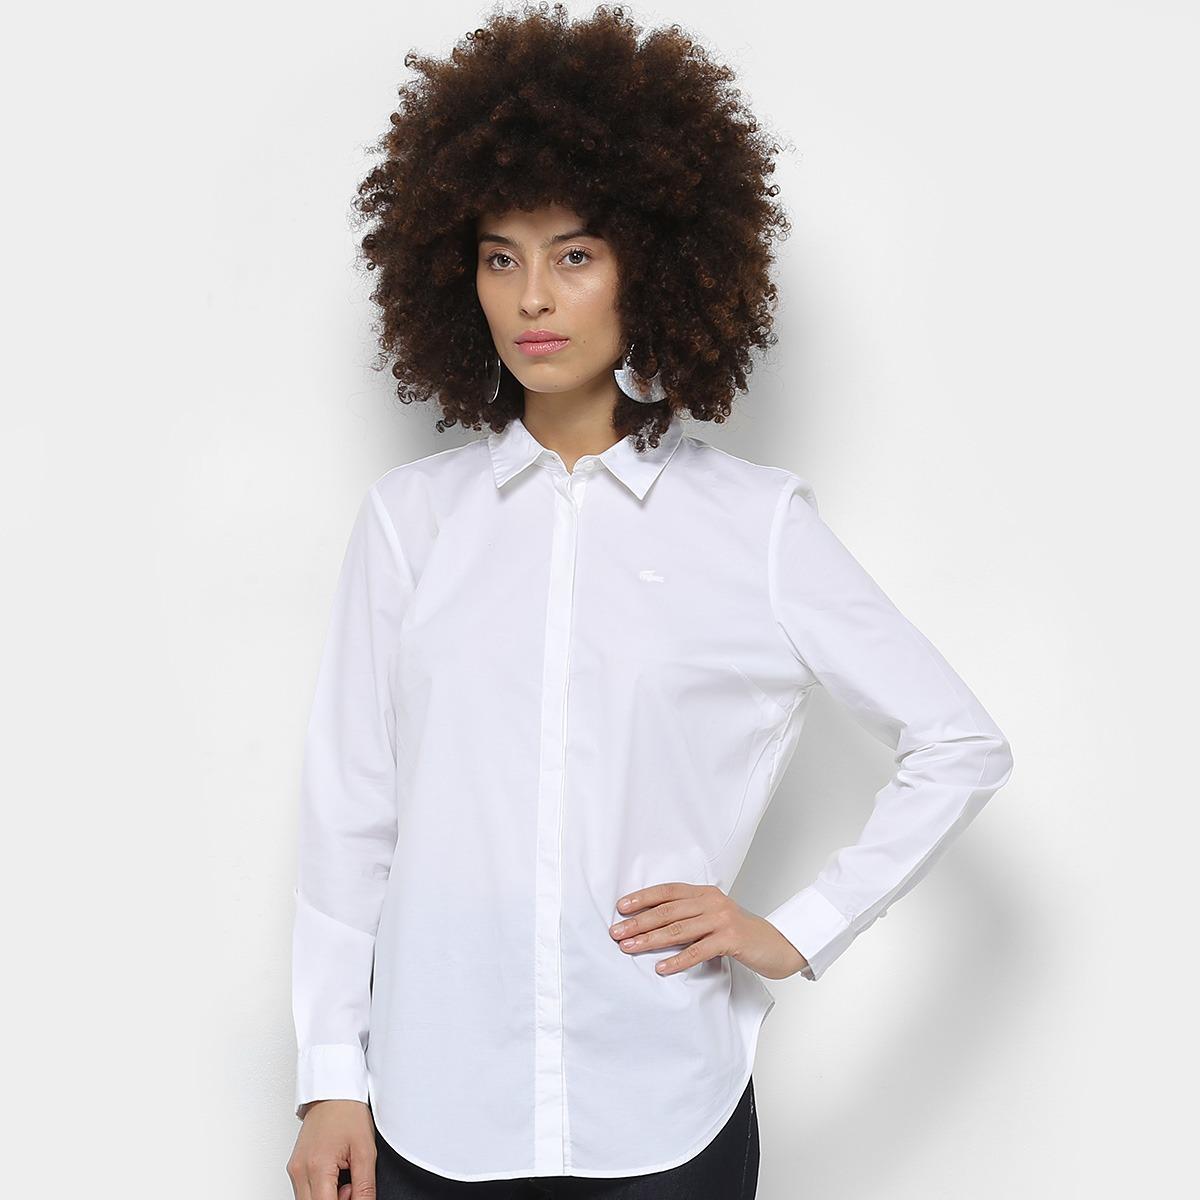 6546b68ca2dac camisa social lacoste feminina slim fit - branca. Carregando zoom.